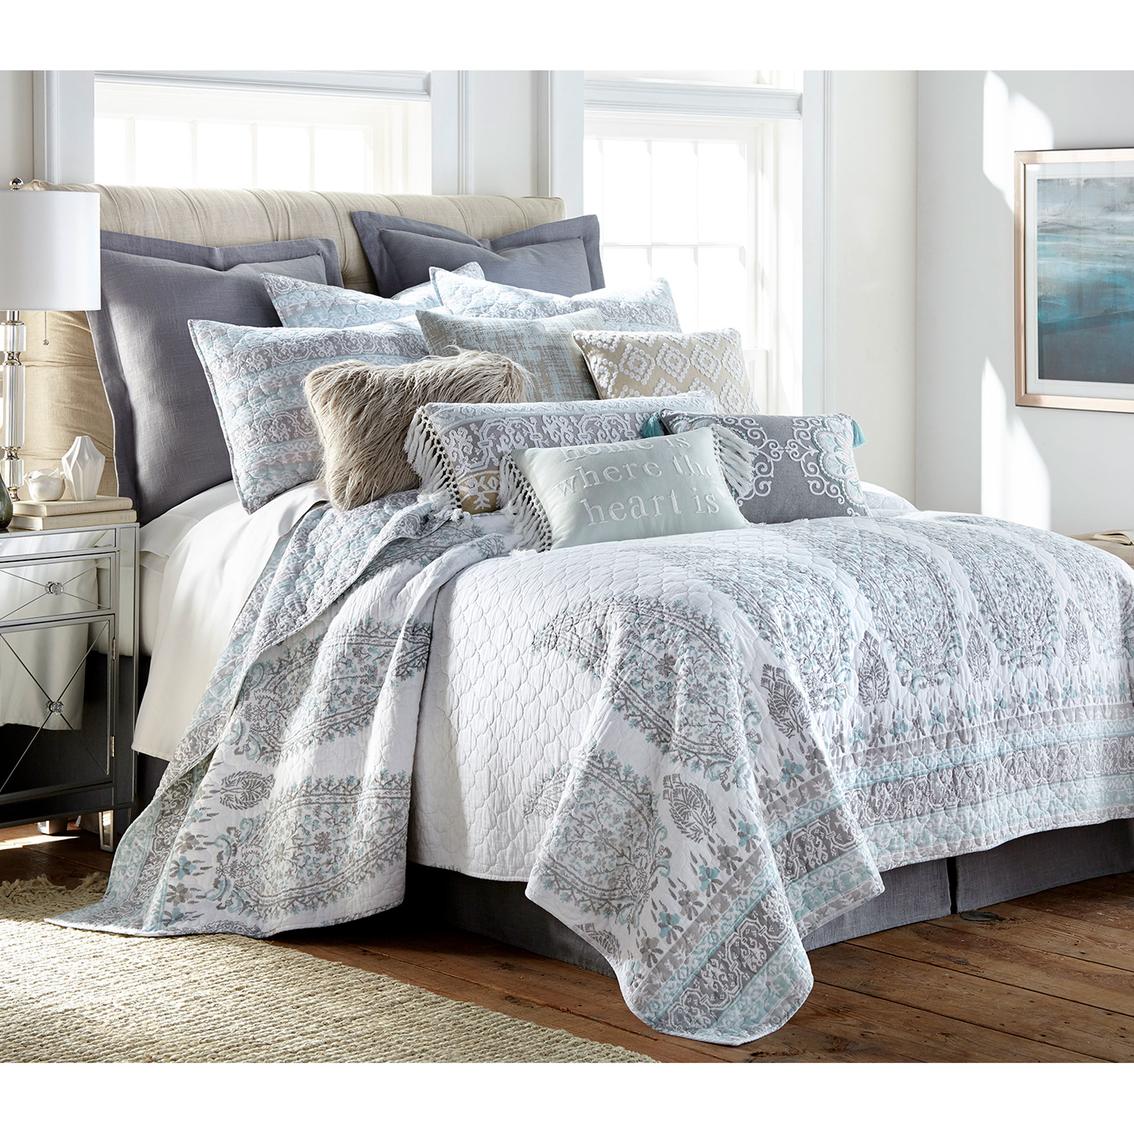 Levtex Home Josie Spa Quilt Set Bedding Sets Household Shop The Exchange